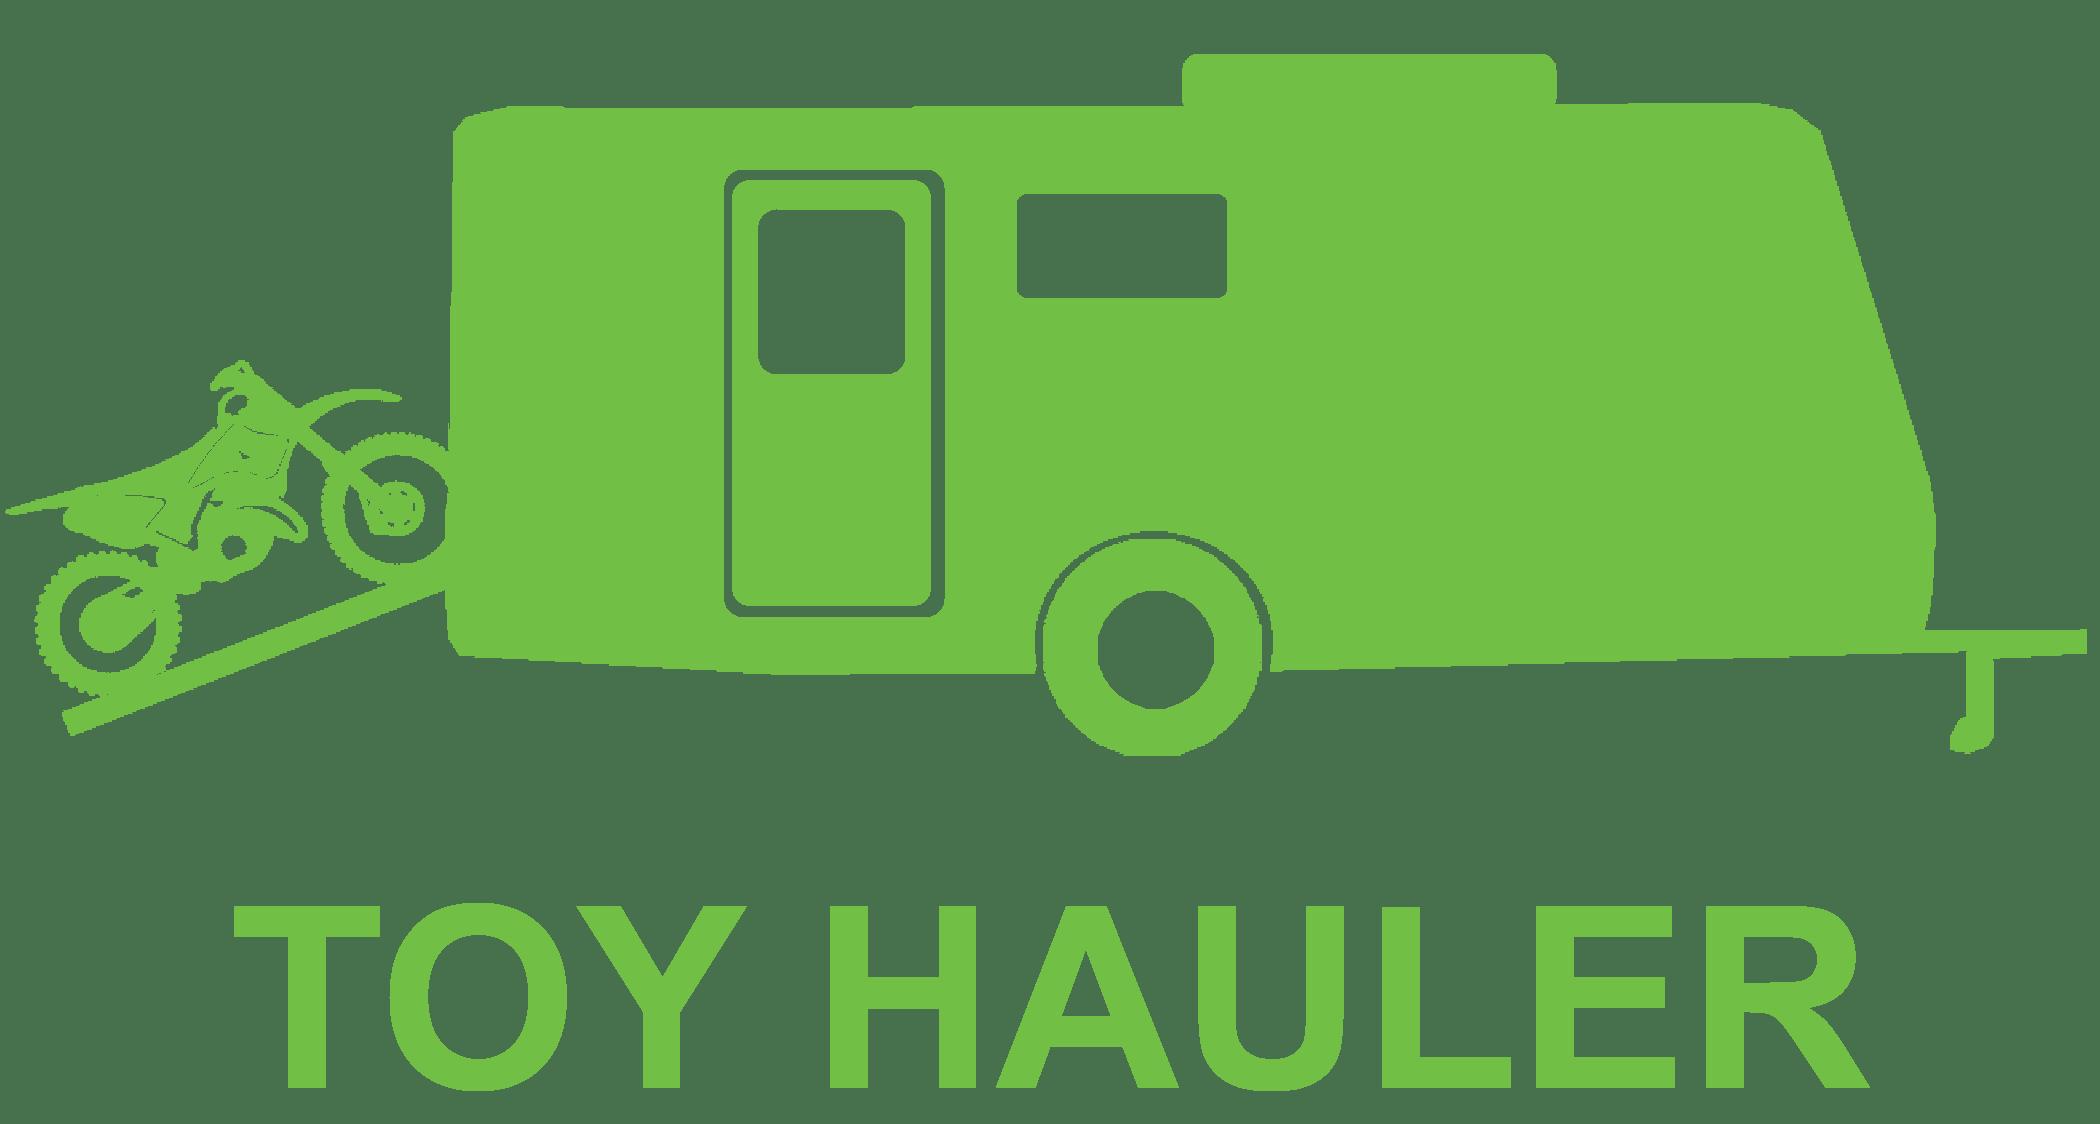 Car hauler trailer clipart jpg transparent stock RVnGO | RV Rentals | America's Best RV Rentals jpg transparent stock